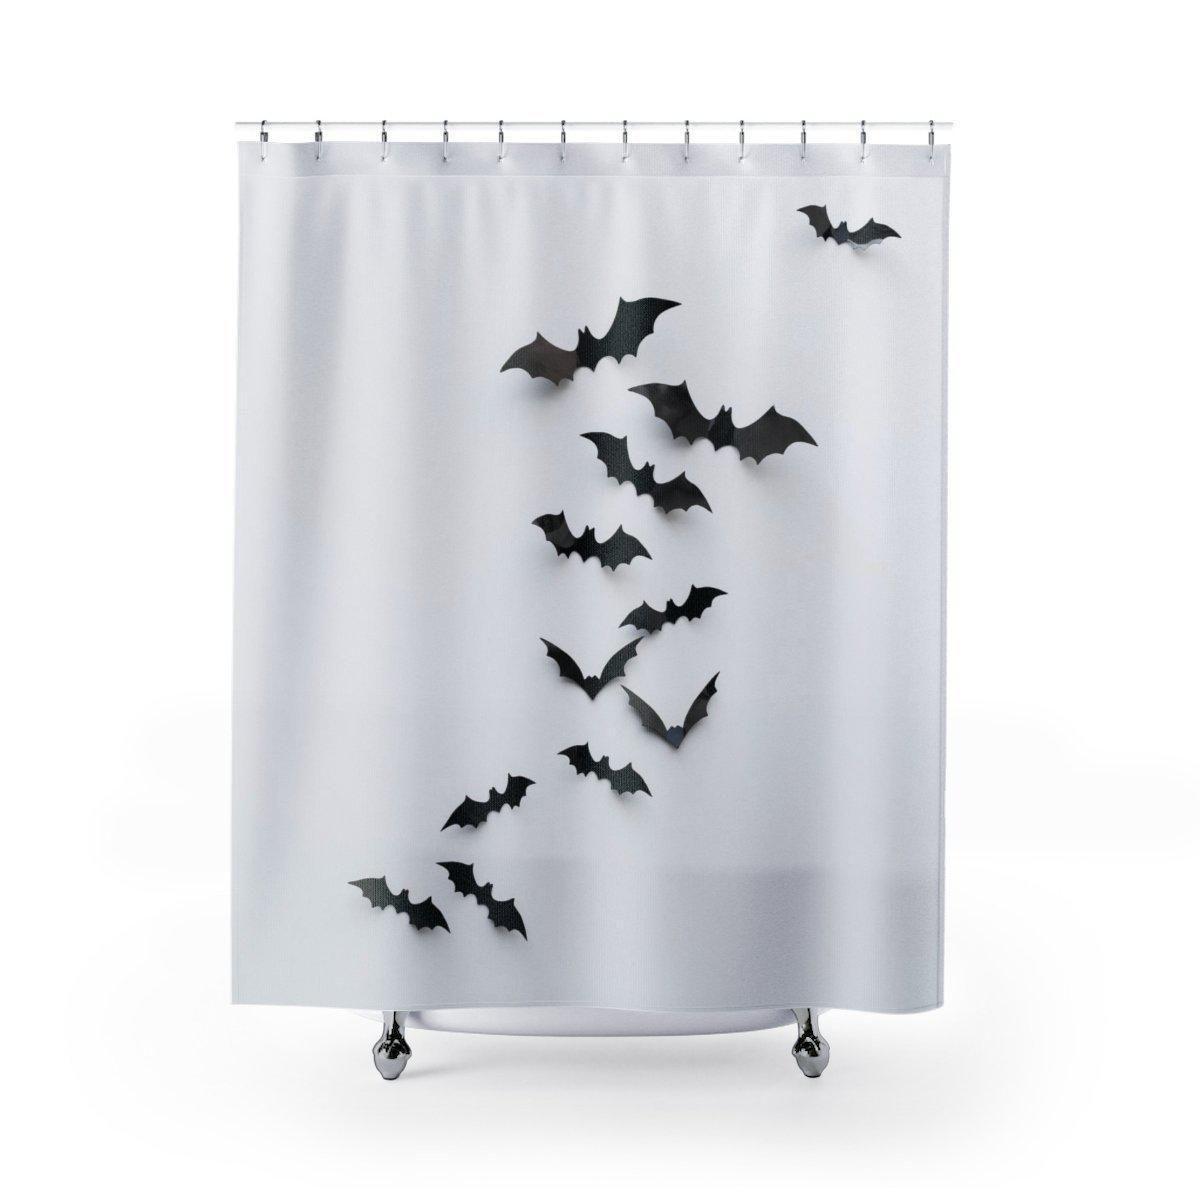 Black Bat Shower Curtain Halloween Shower Curtain Curtains Shower